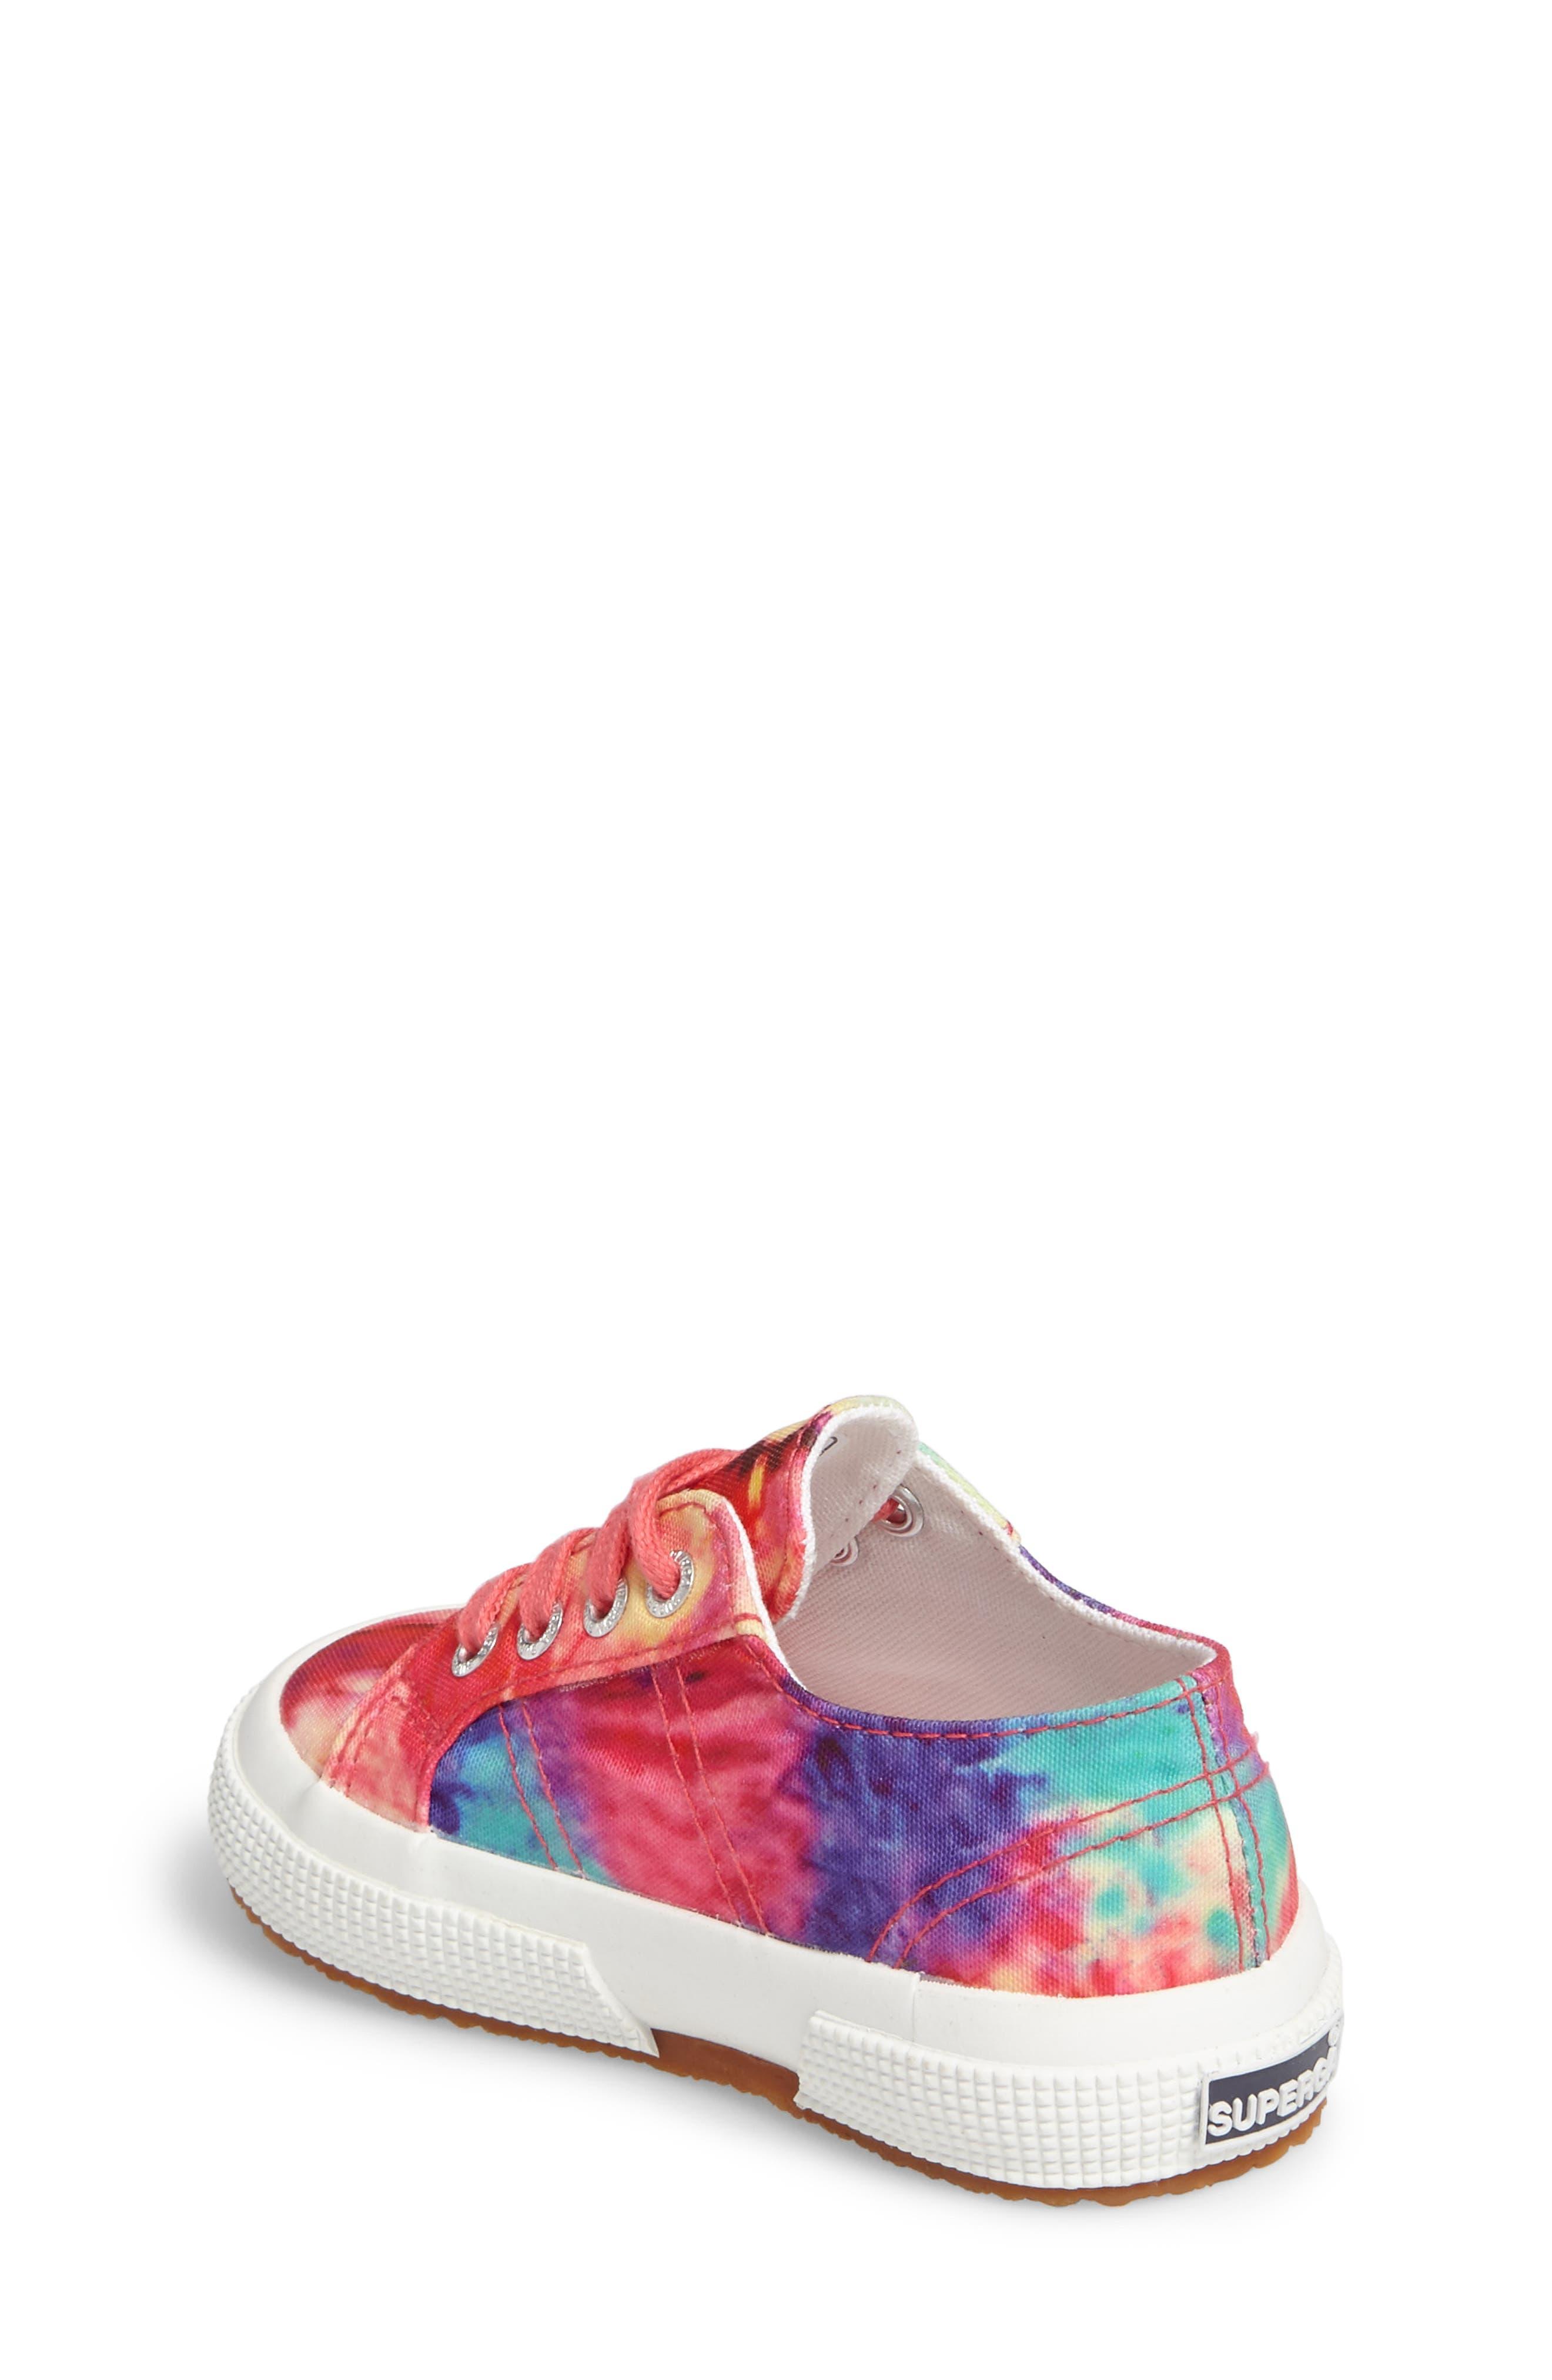 Tie Dye Classic Sneaker,                             Alternate thumbnail 2, color,                             807